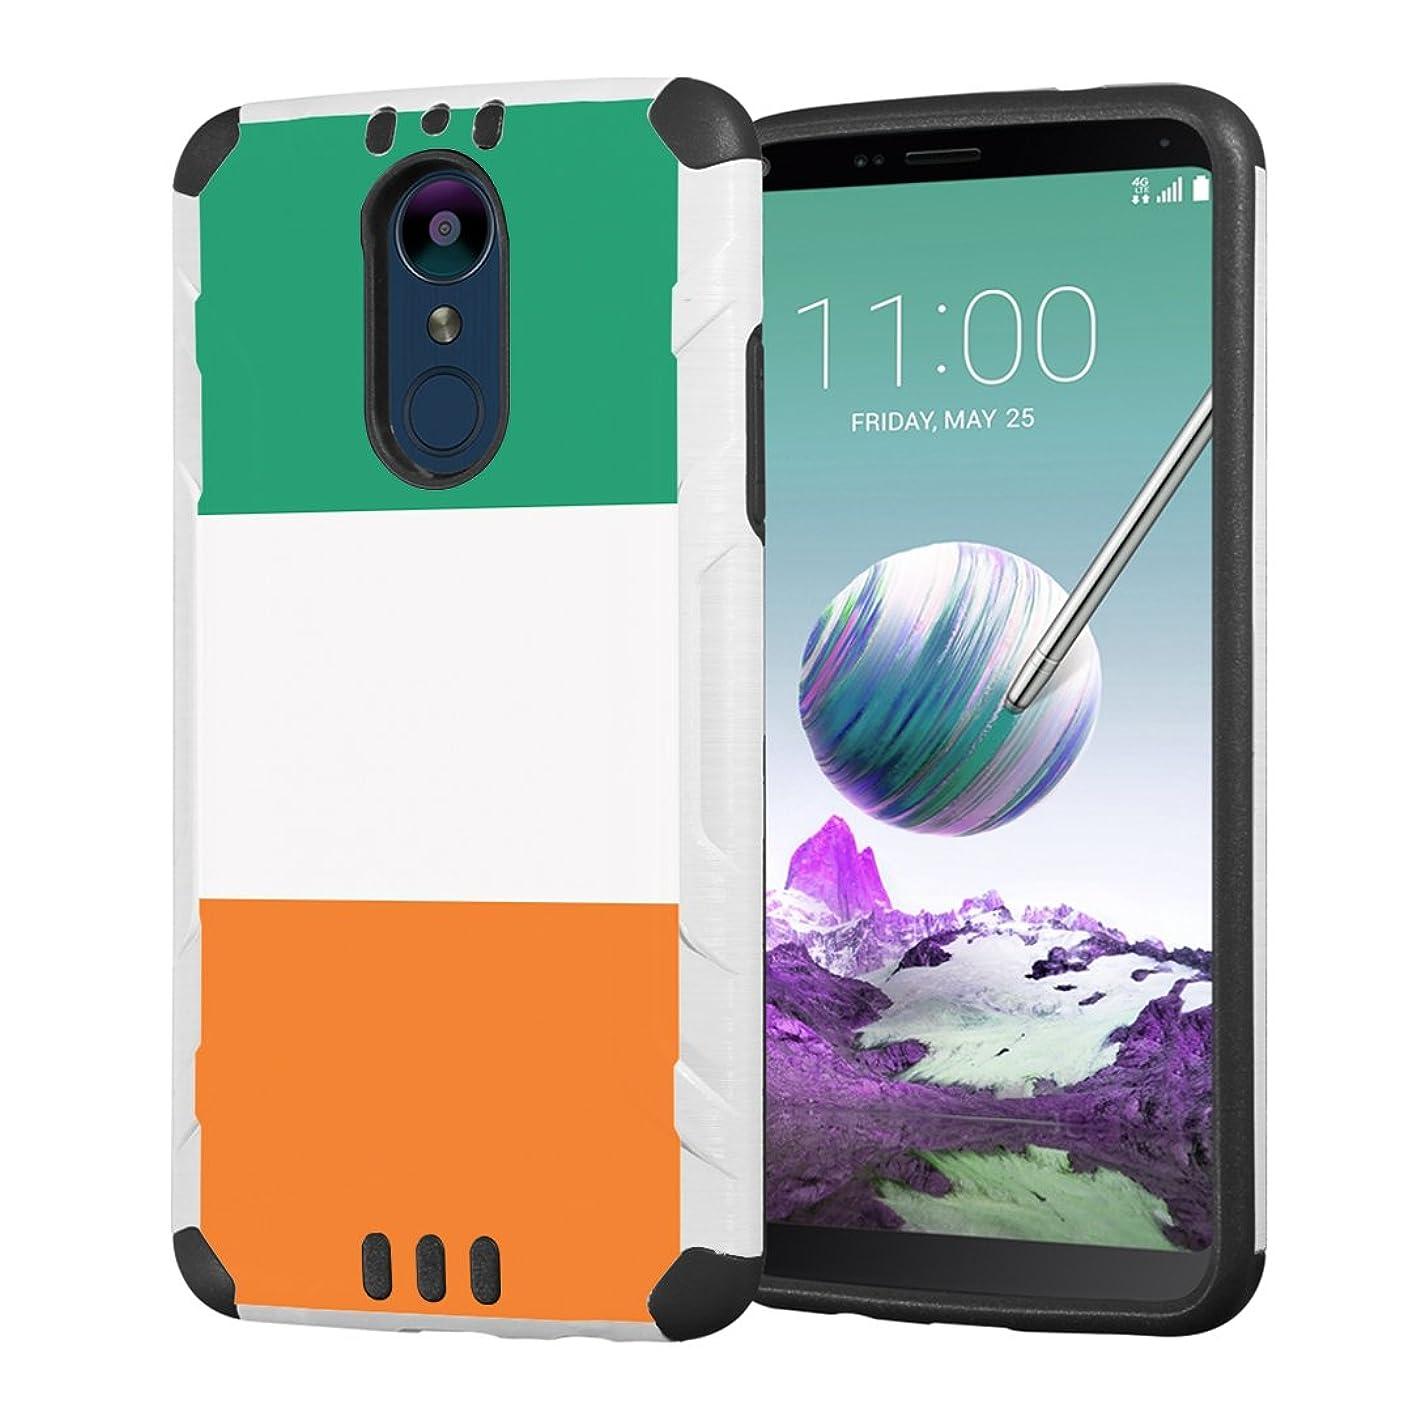 Moriko Case Compatible with LG Stylo 4 Plus, LG Stylo 4, LG Q Stylus [Drop Protection Hybrid Dual Layer Armor Protective Dual Layer Case White] for LG Stylo 4 - (Ireland Flag)